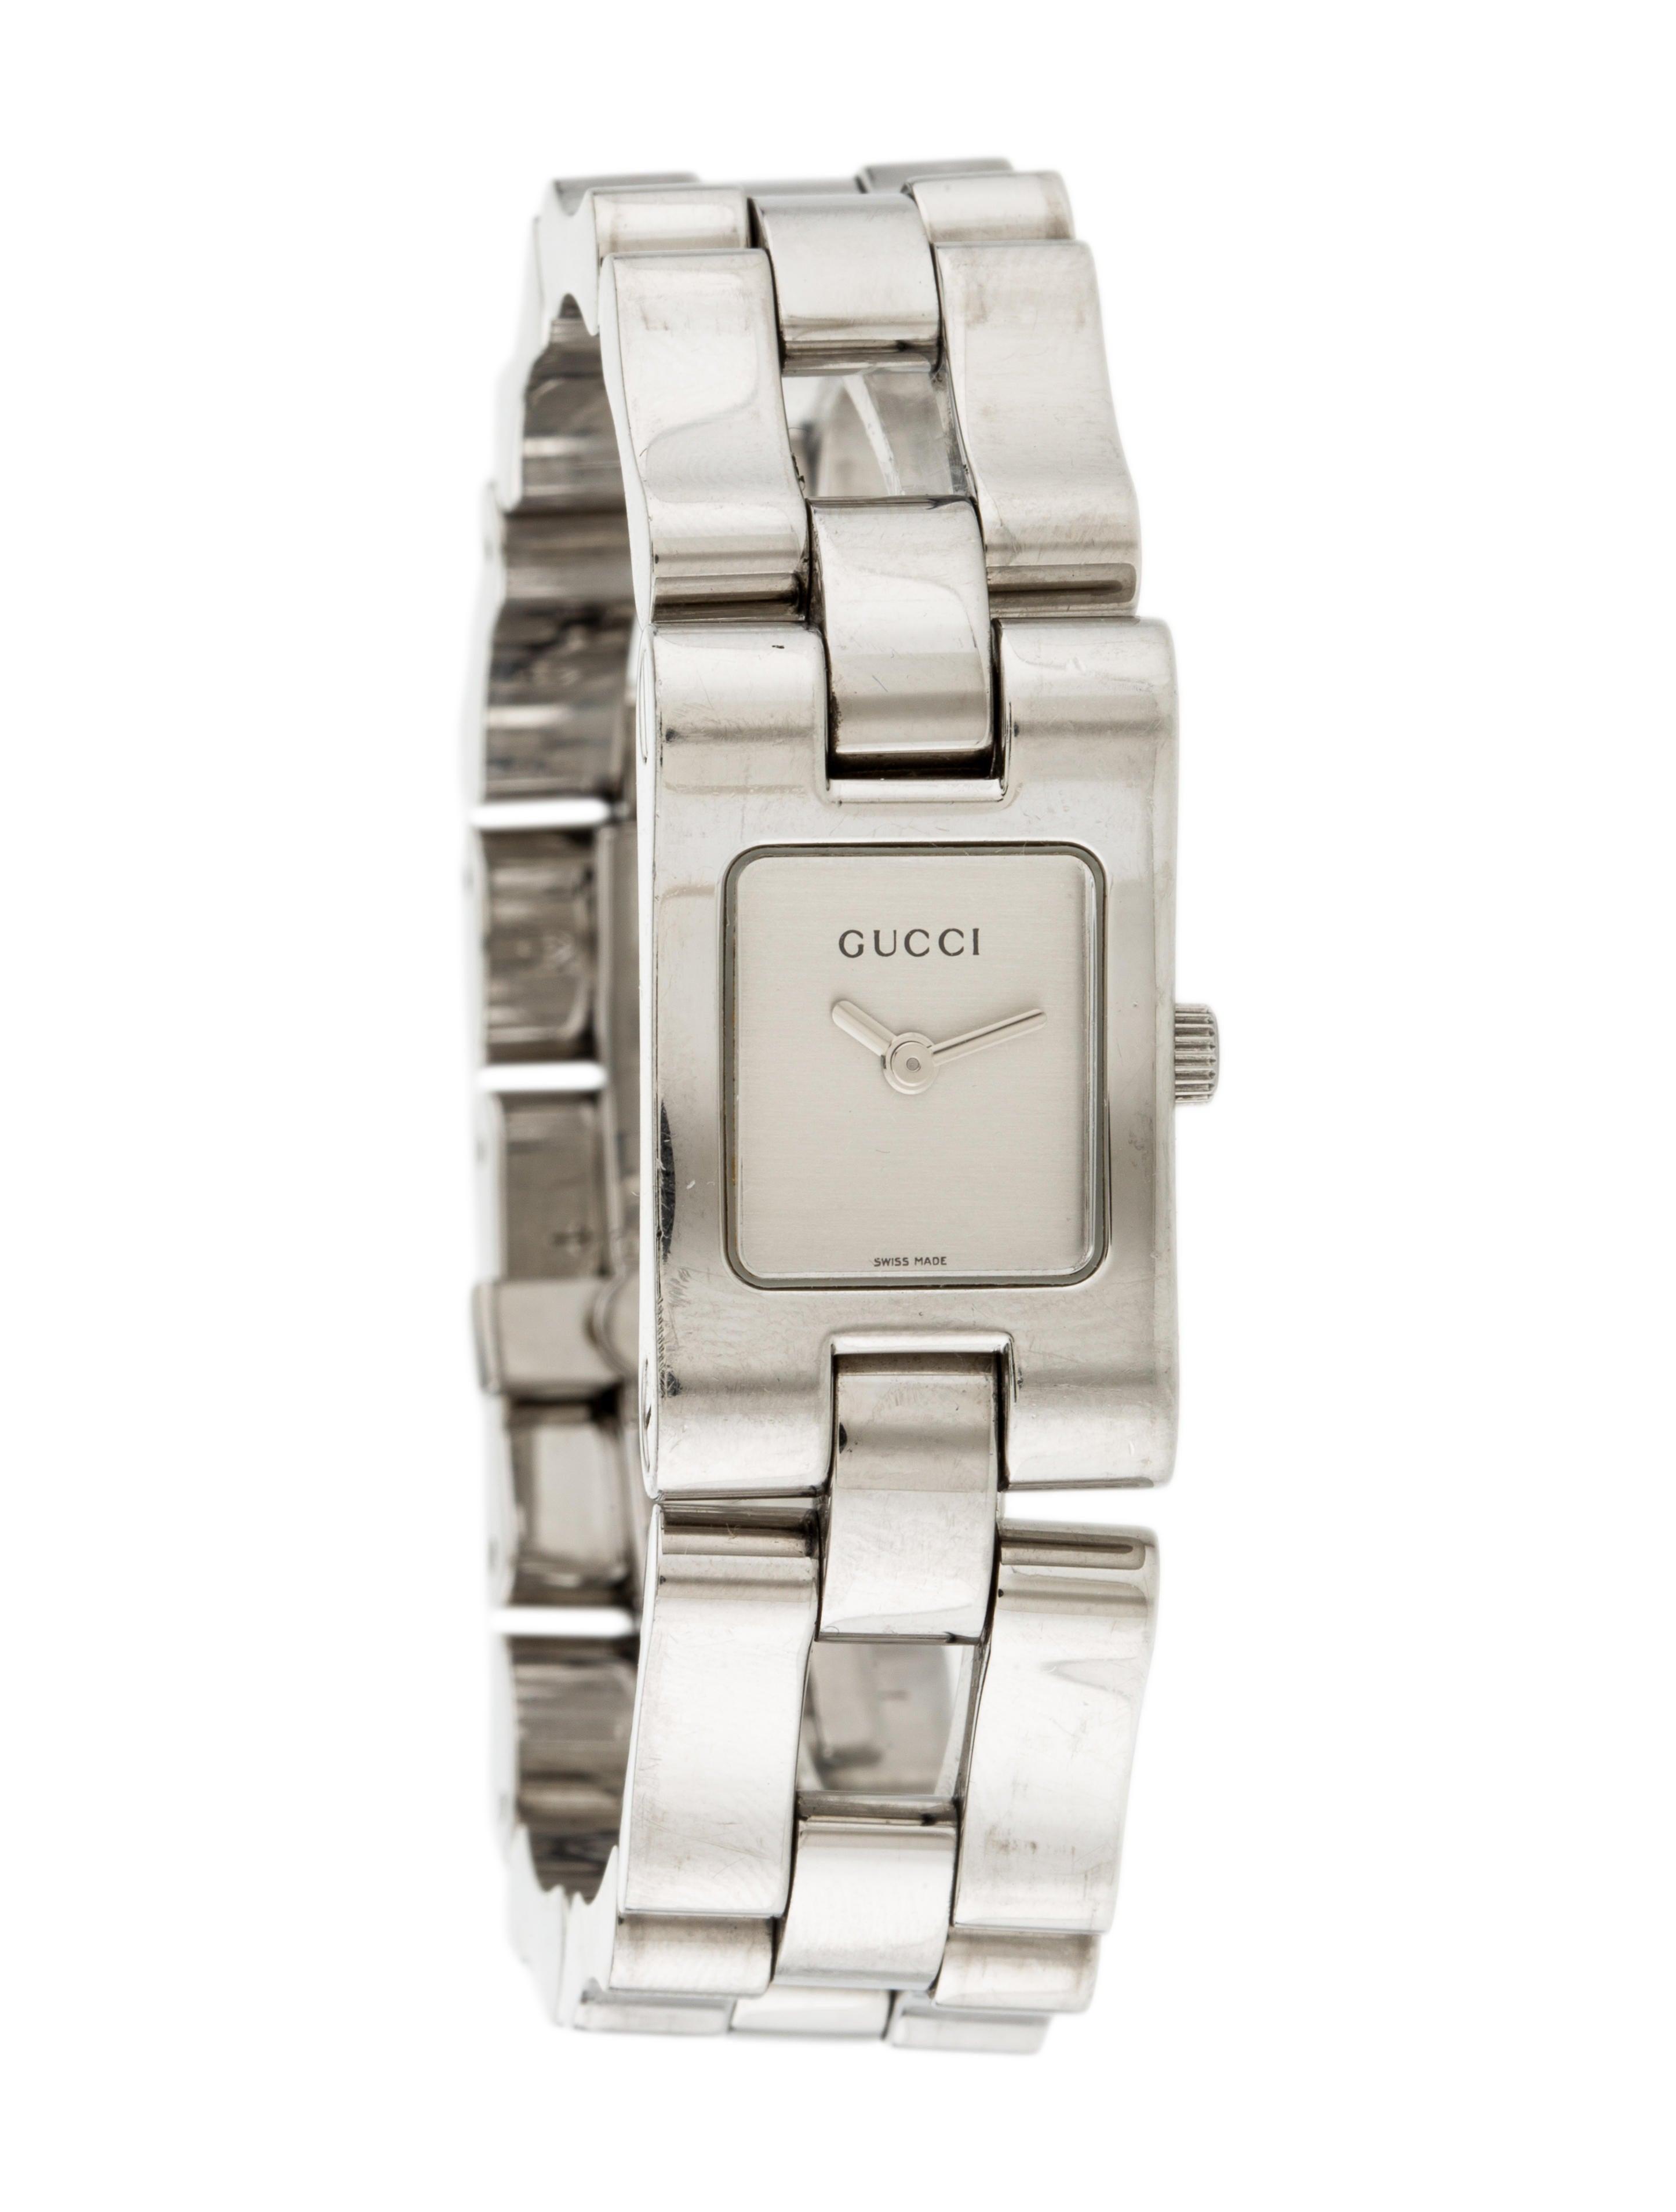 d1feee99697 Gucci 2305L Watch - Bracelet - GUC103047